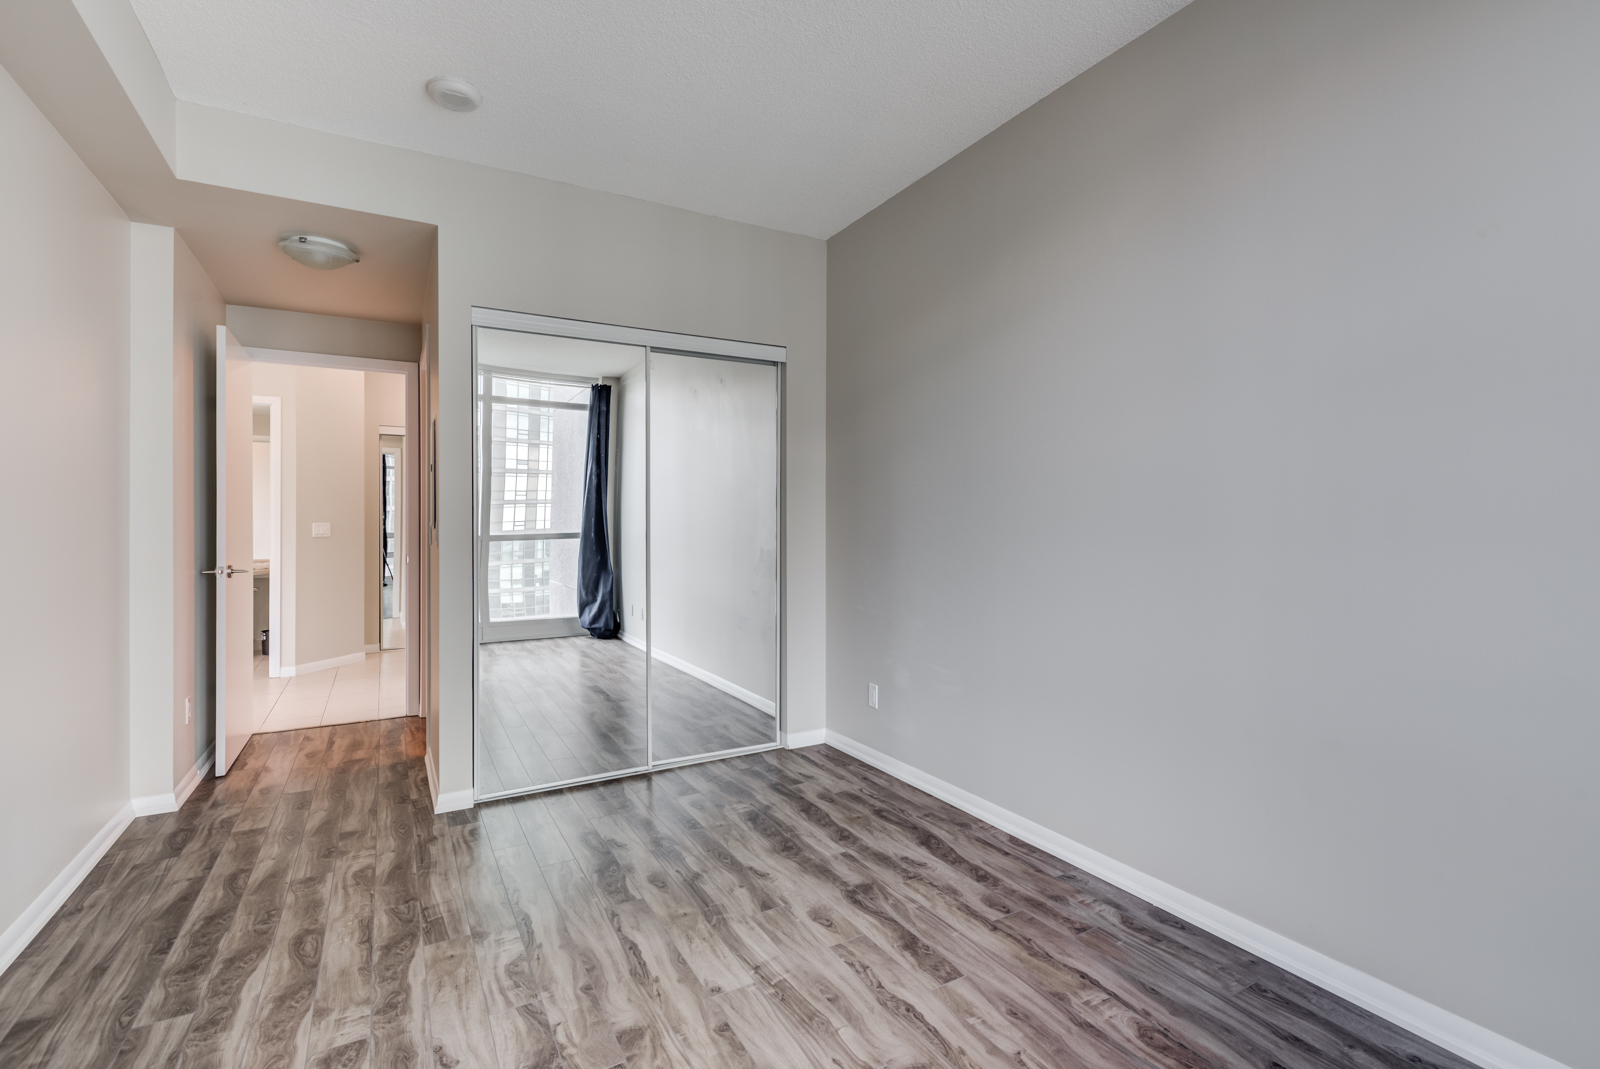 Empty master bedroom with dark brown laminate floors and closet with mirror doors.